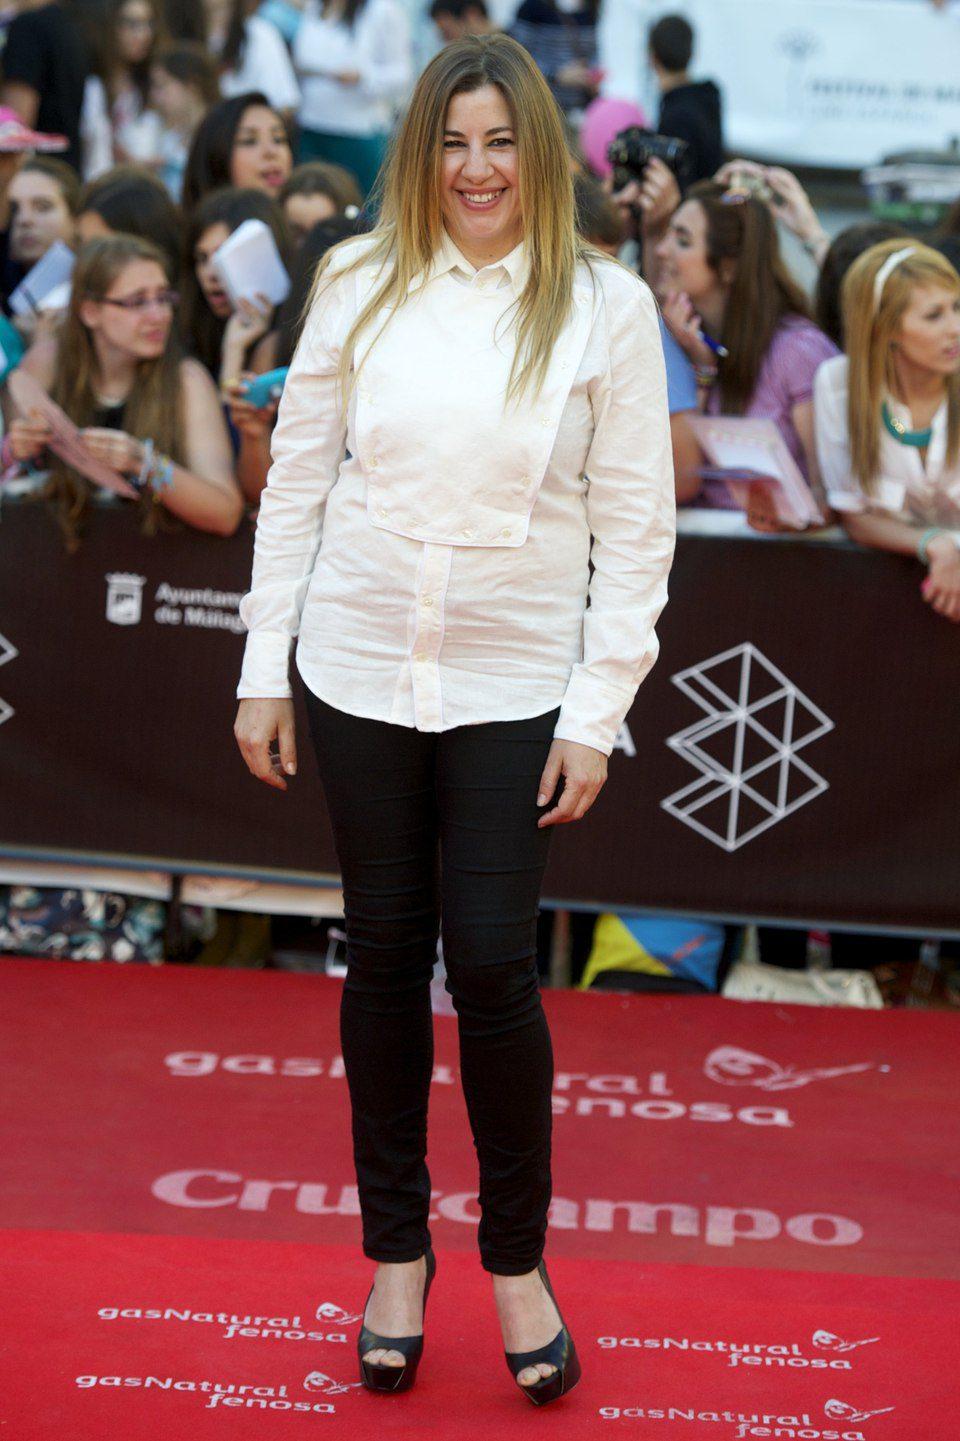 Pepa Charro en la clausura del Festival de Málaga 2013